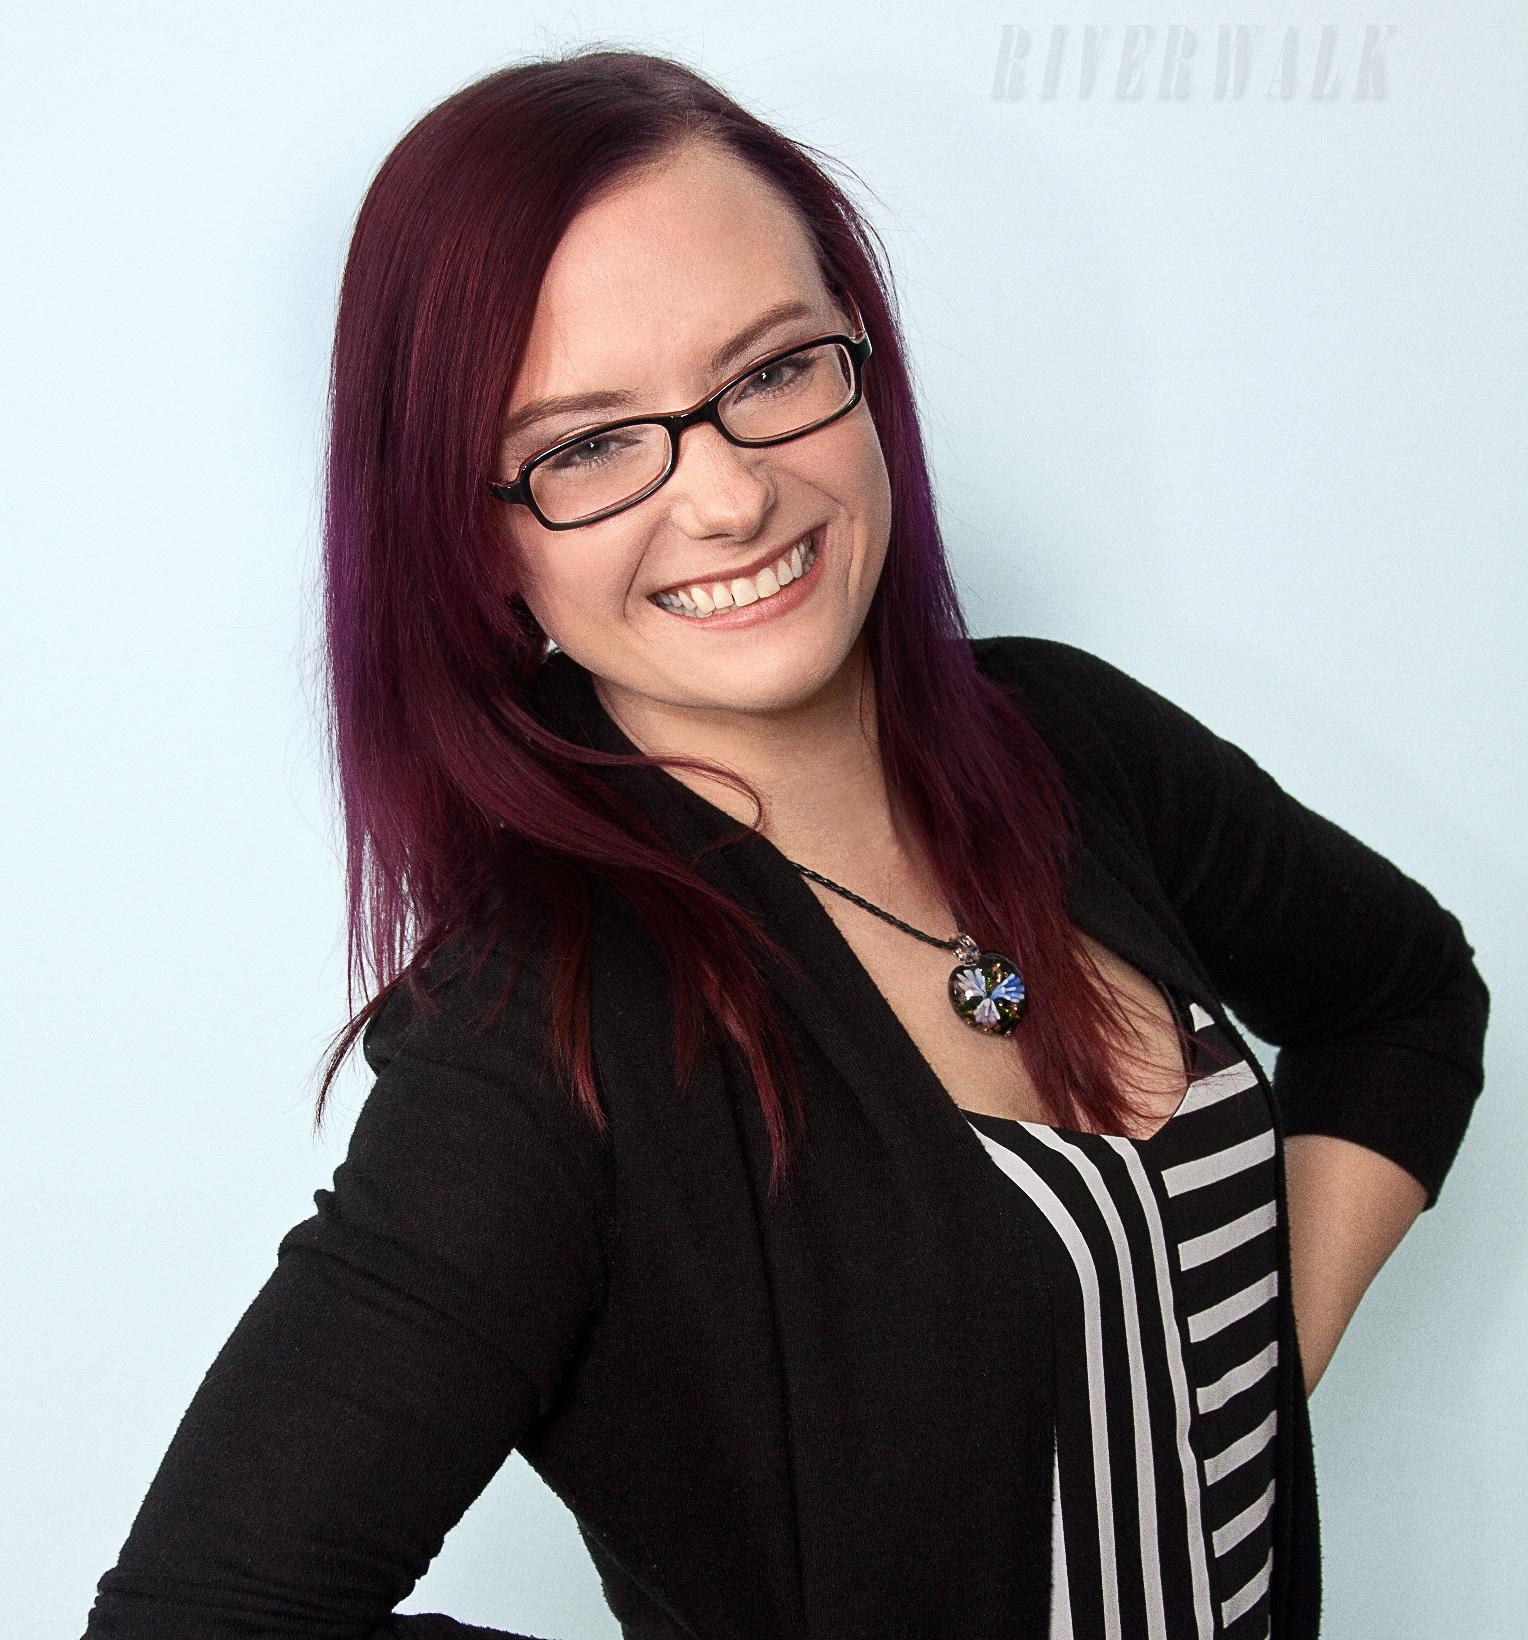 Allison Grabarczyk - Dance Teacher